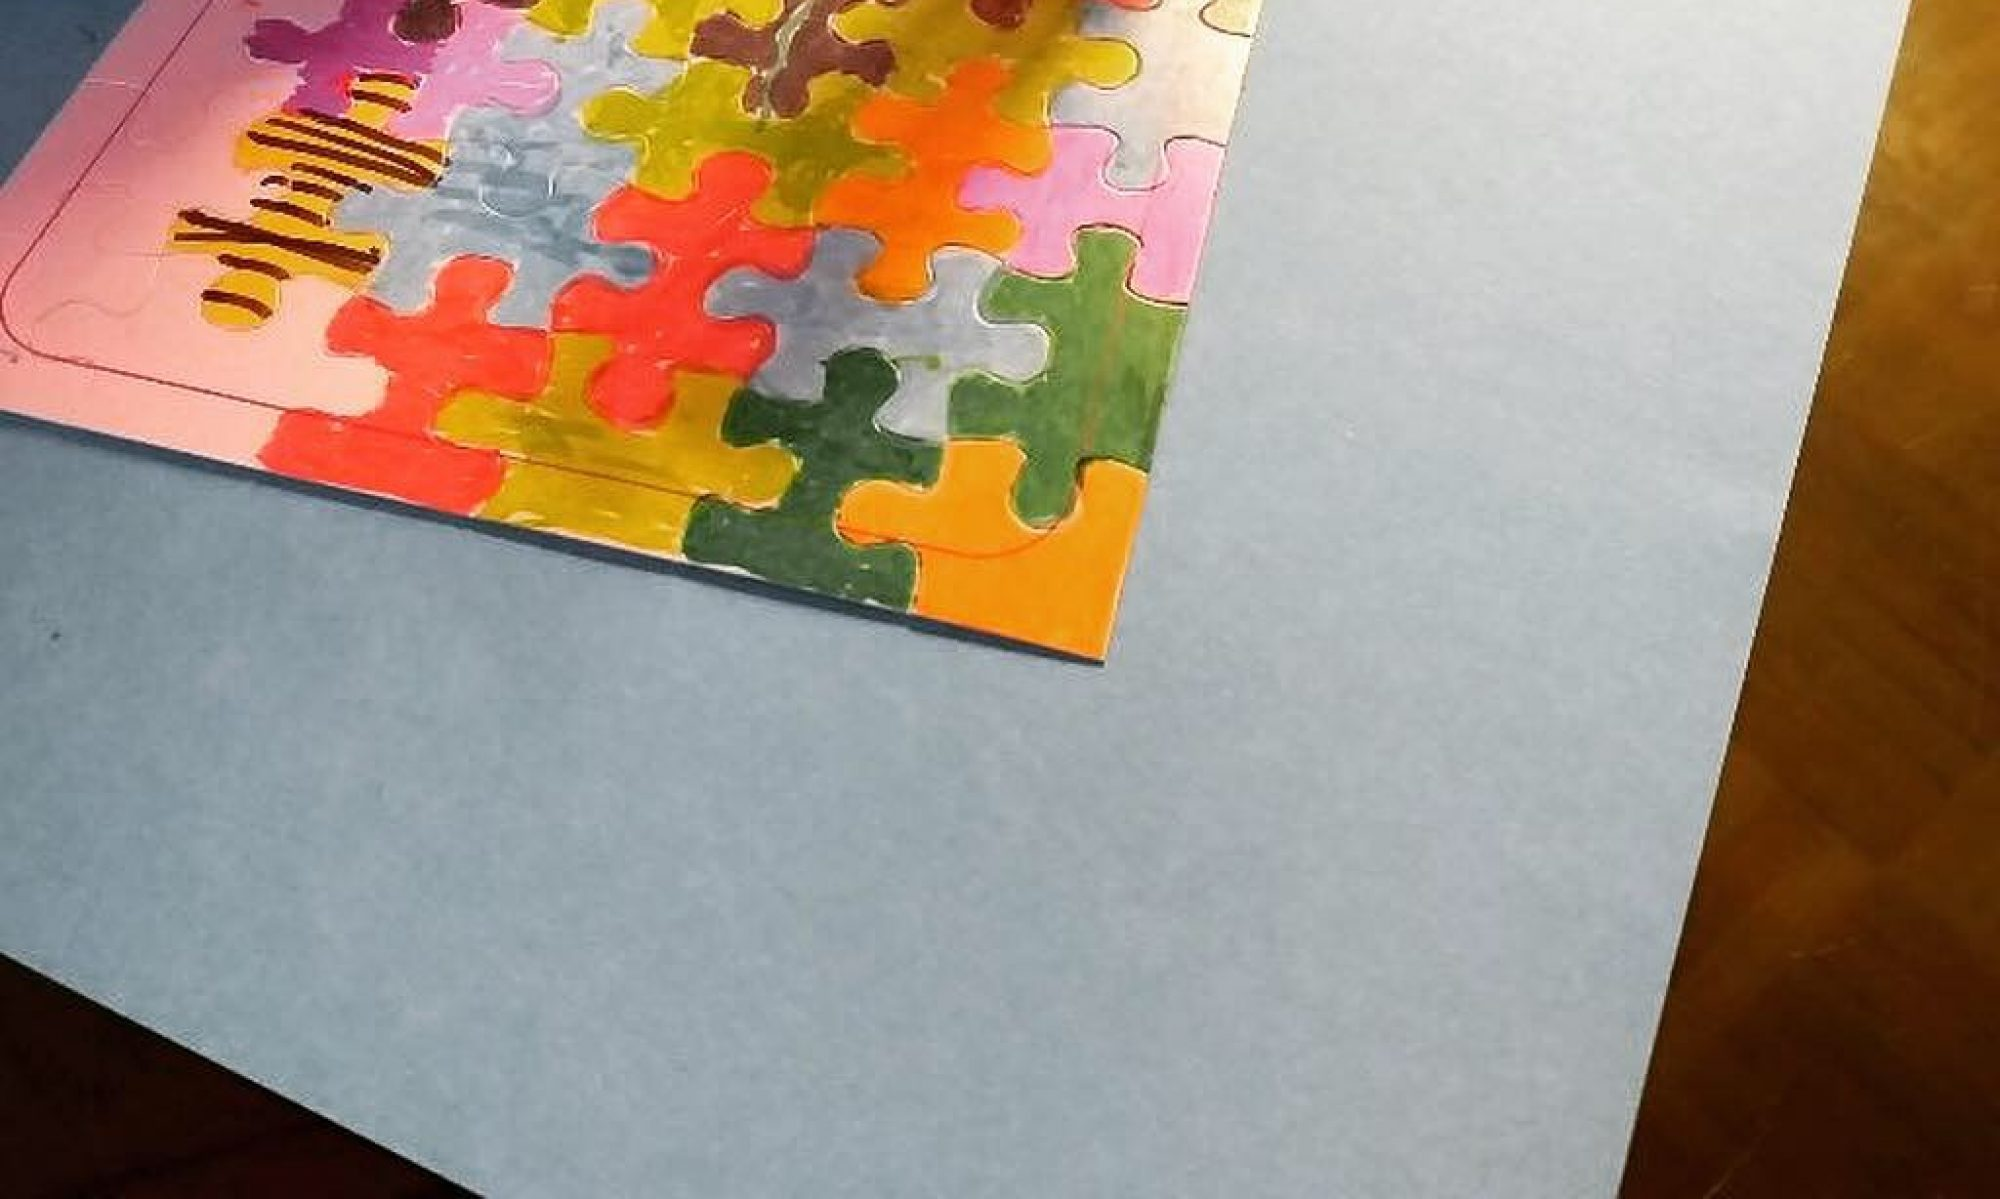 Autismuszentrum Mittelbaden